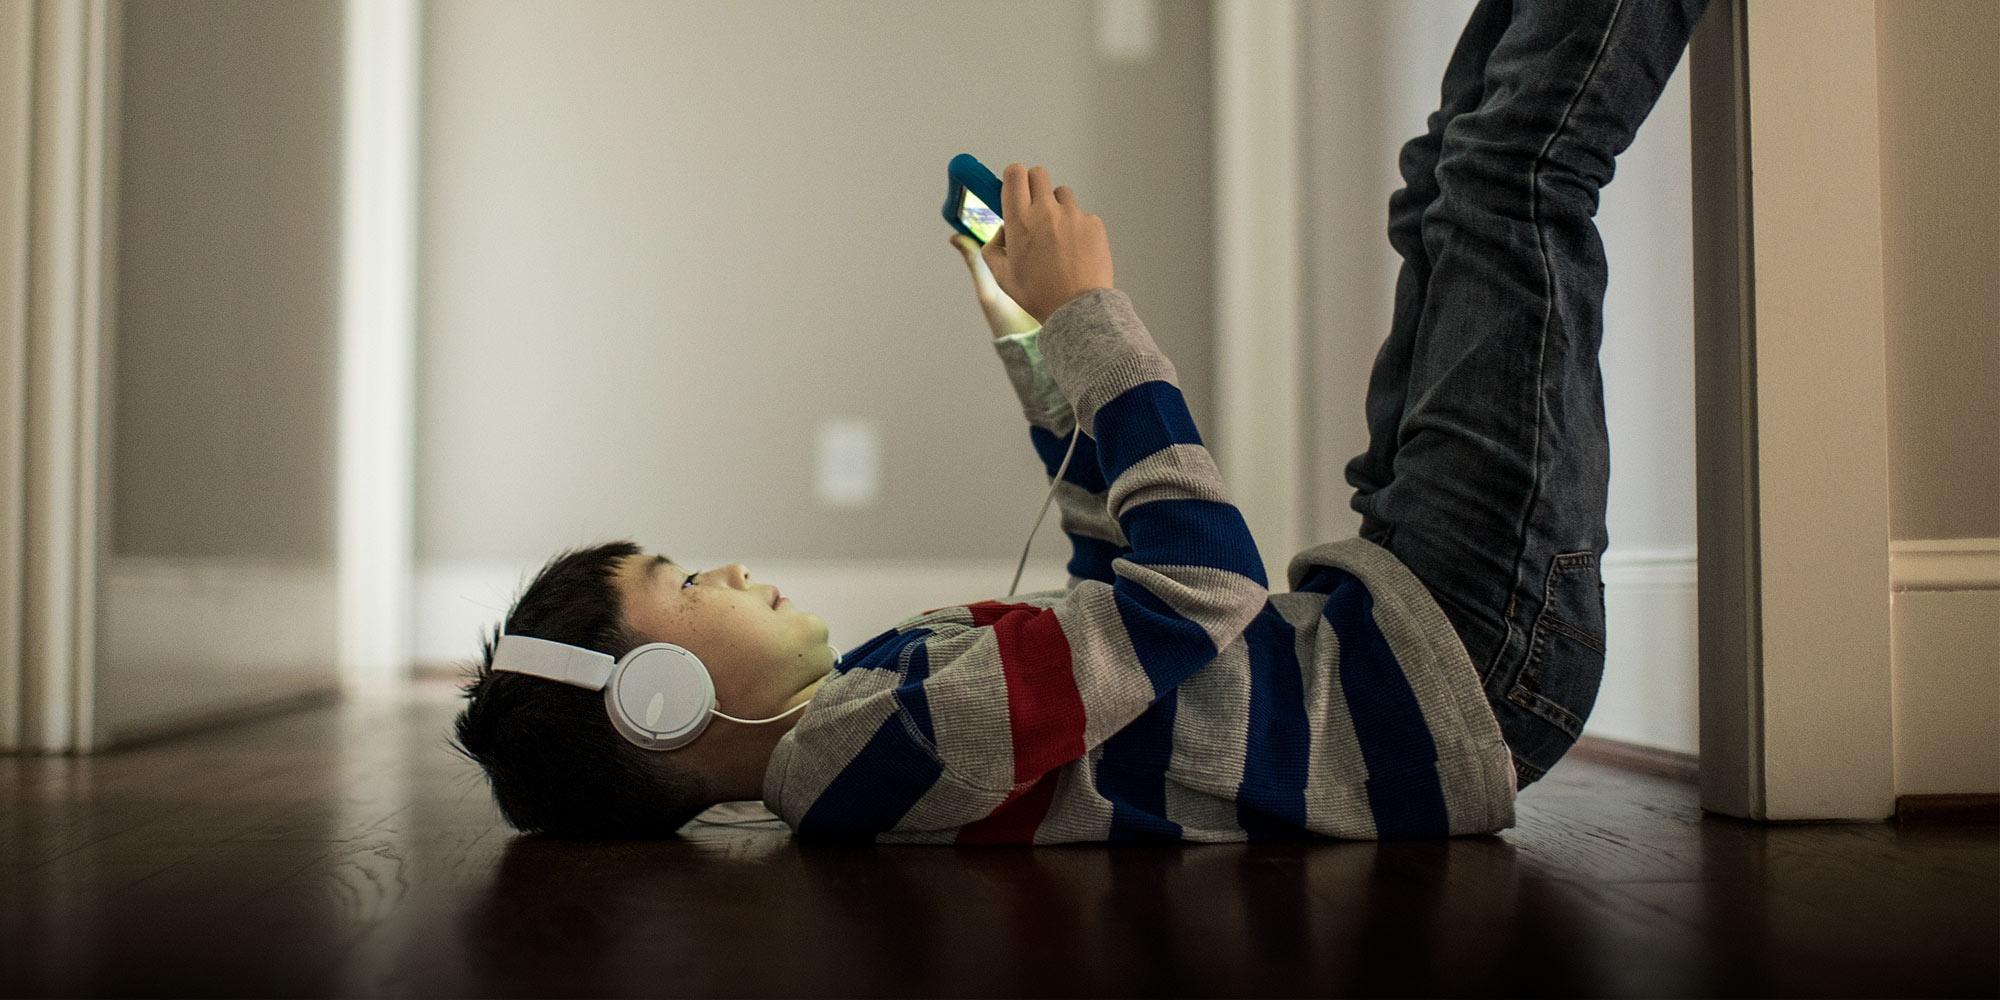 Trẻ em Trung Quốc khó bỏ game online